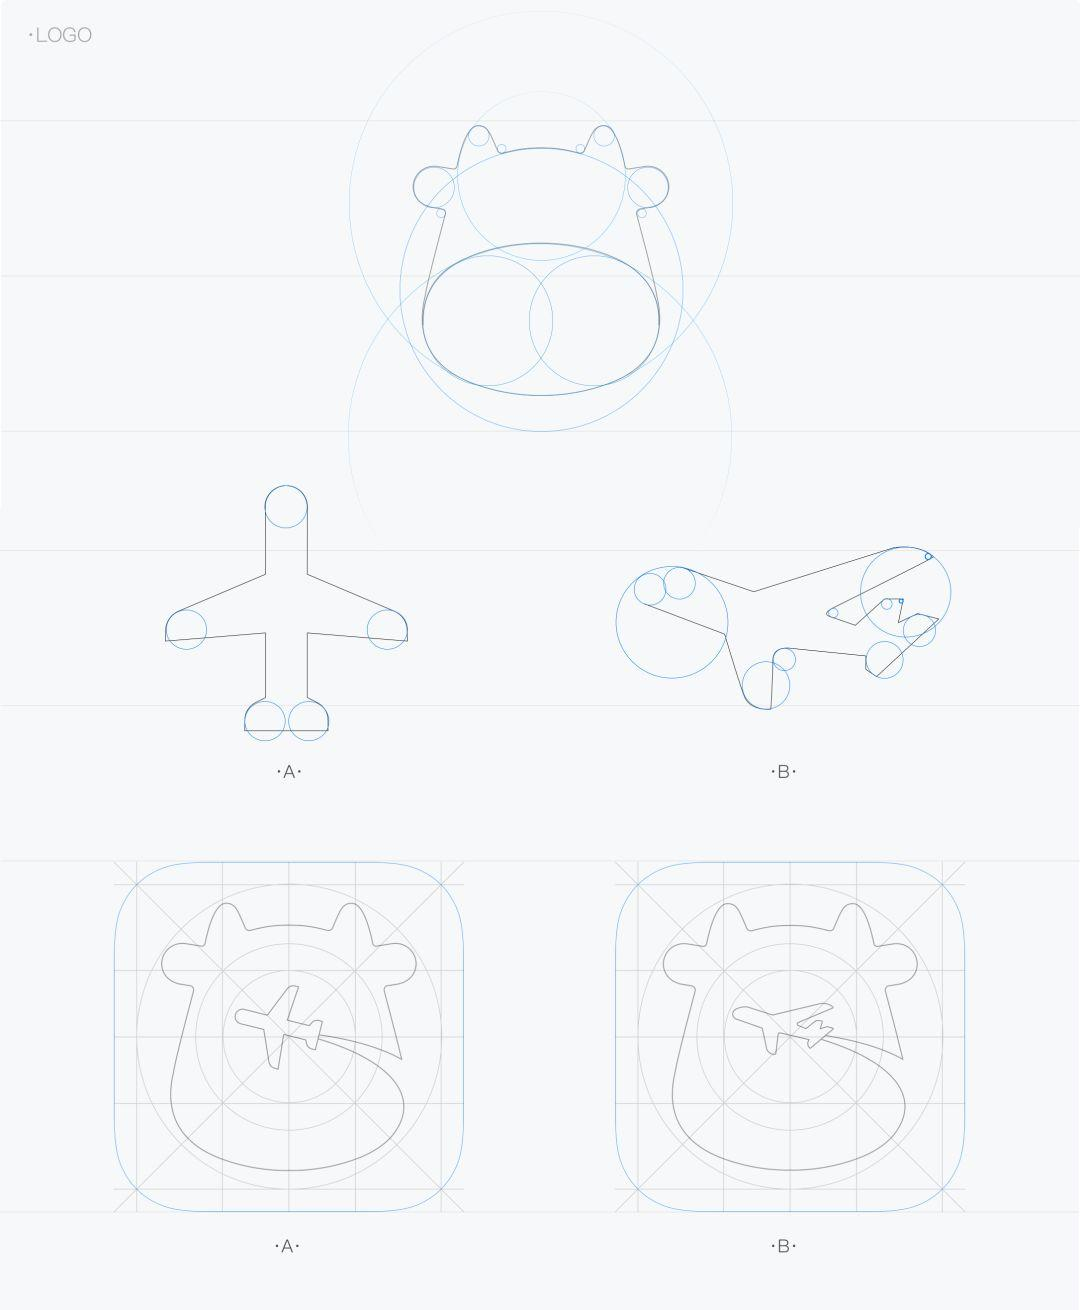 B端产品设计实录——途牛商旅全案塑造